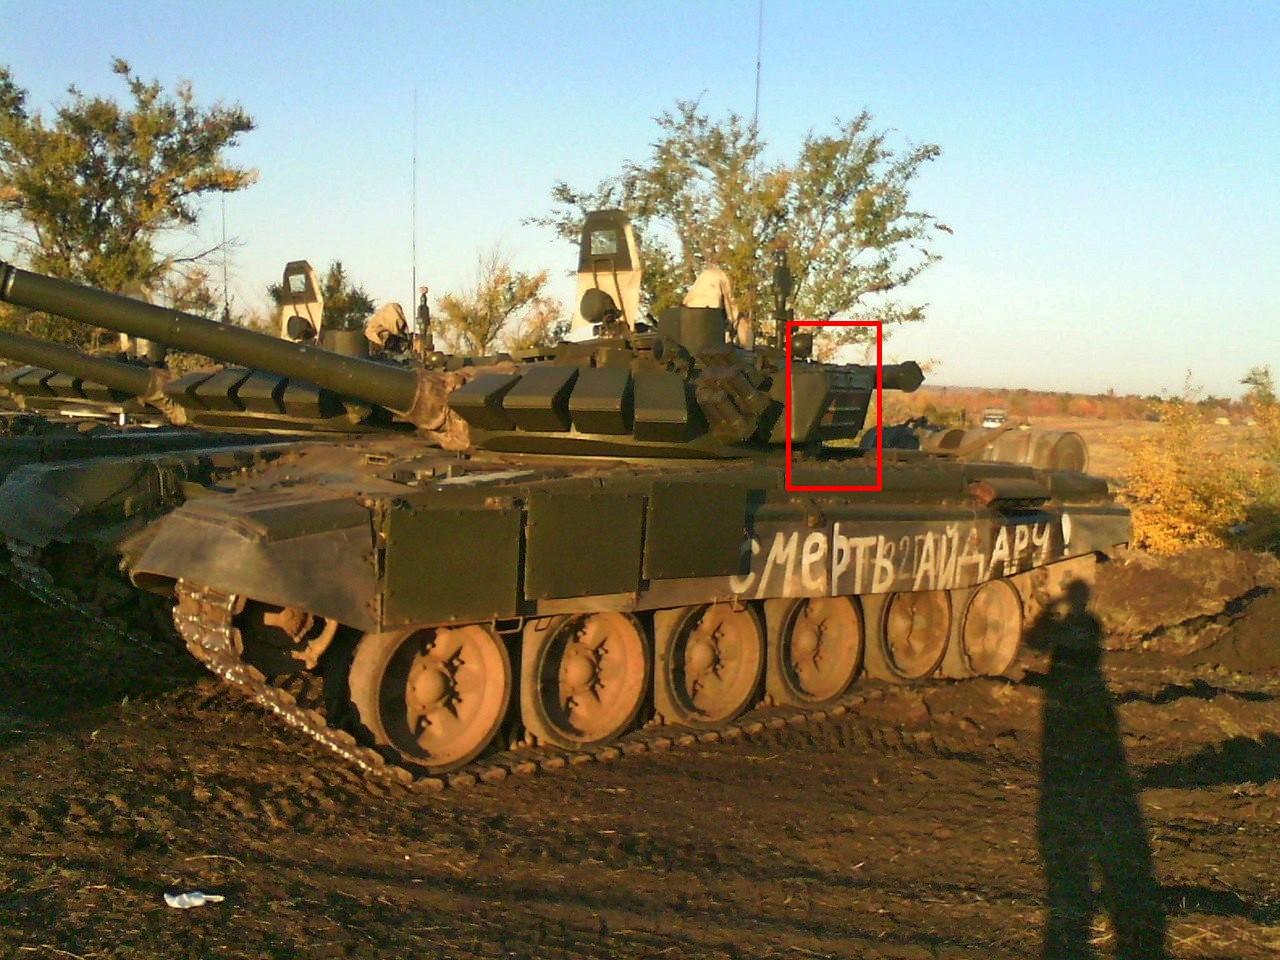 """Death to Aidar!"" likely referring to the Ukrainian Aidar Battalion"